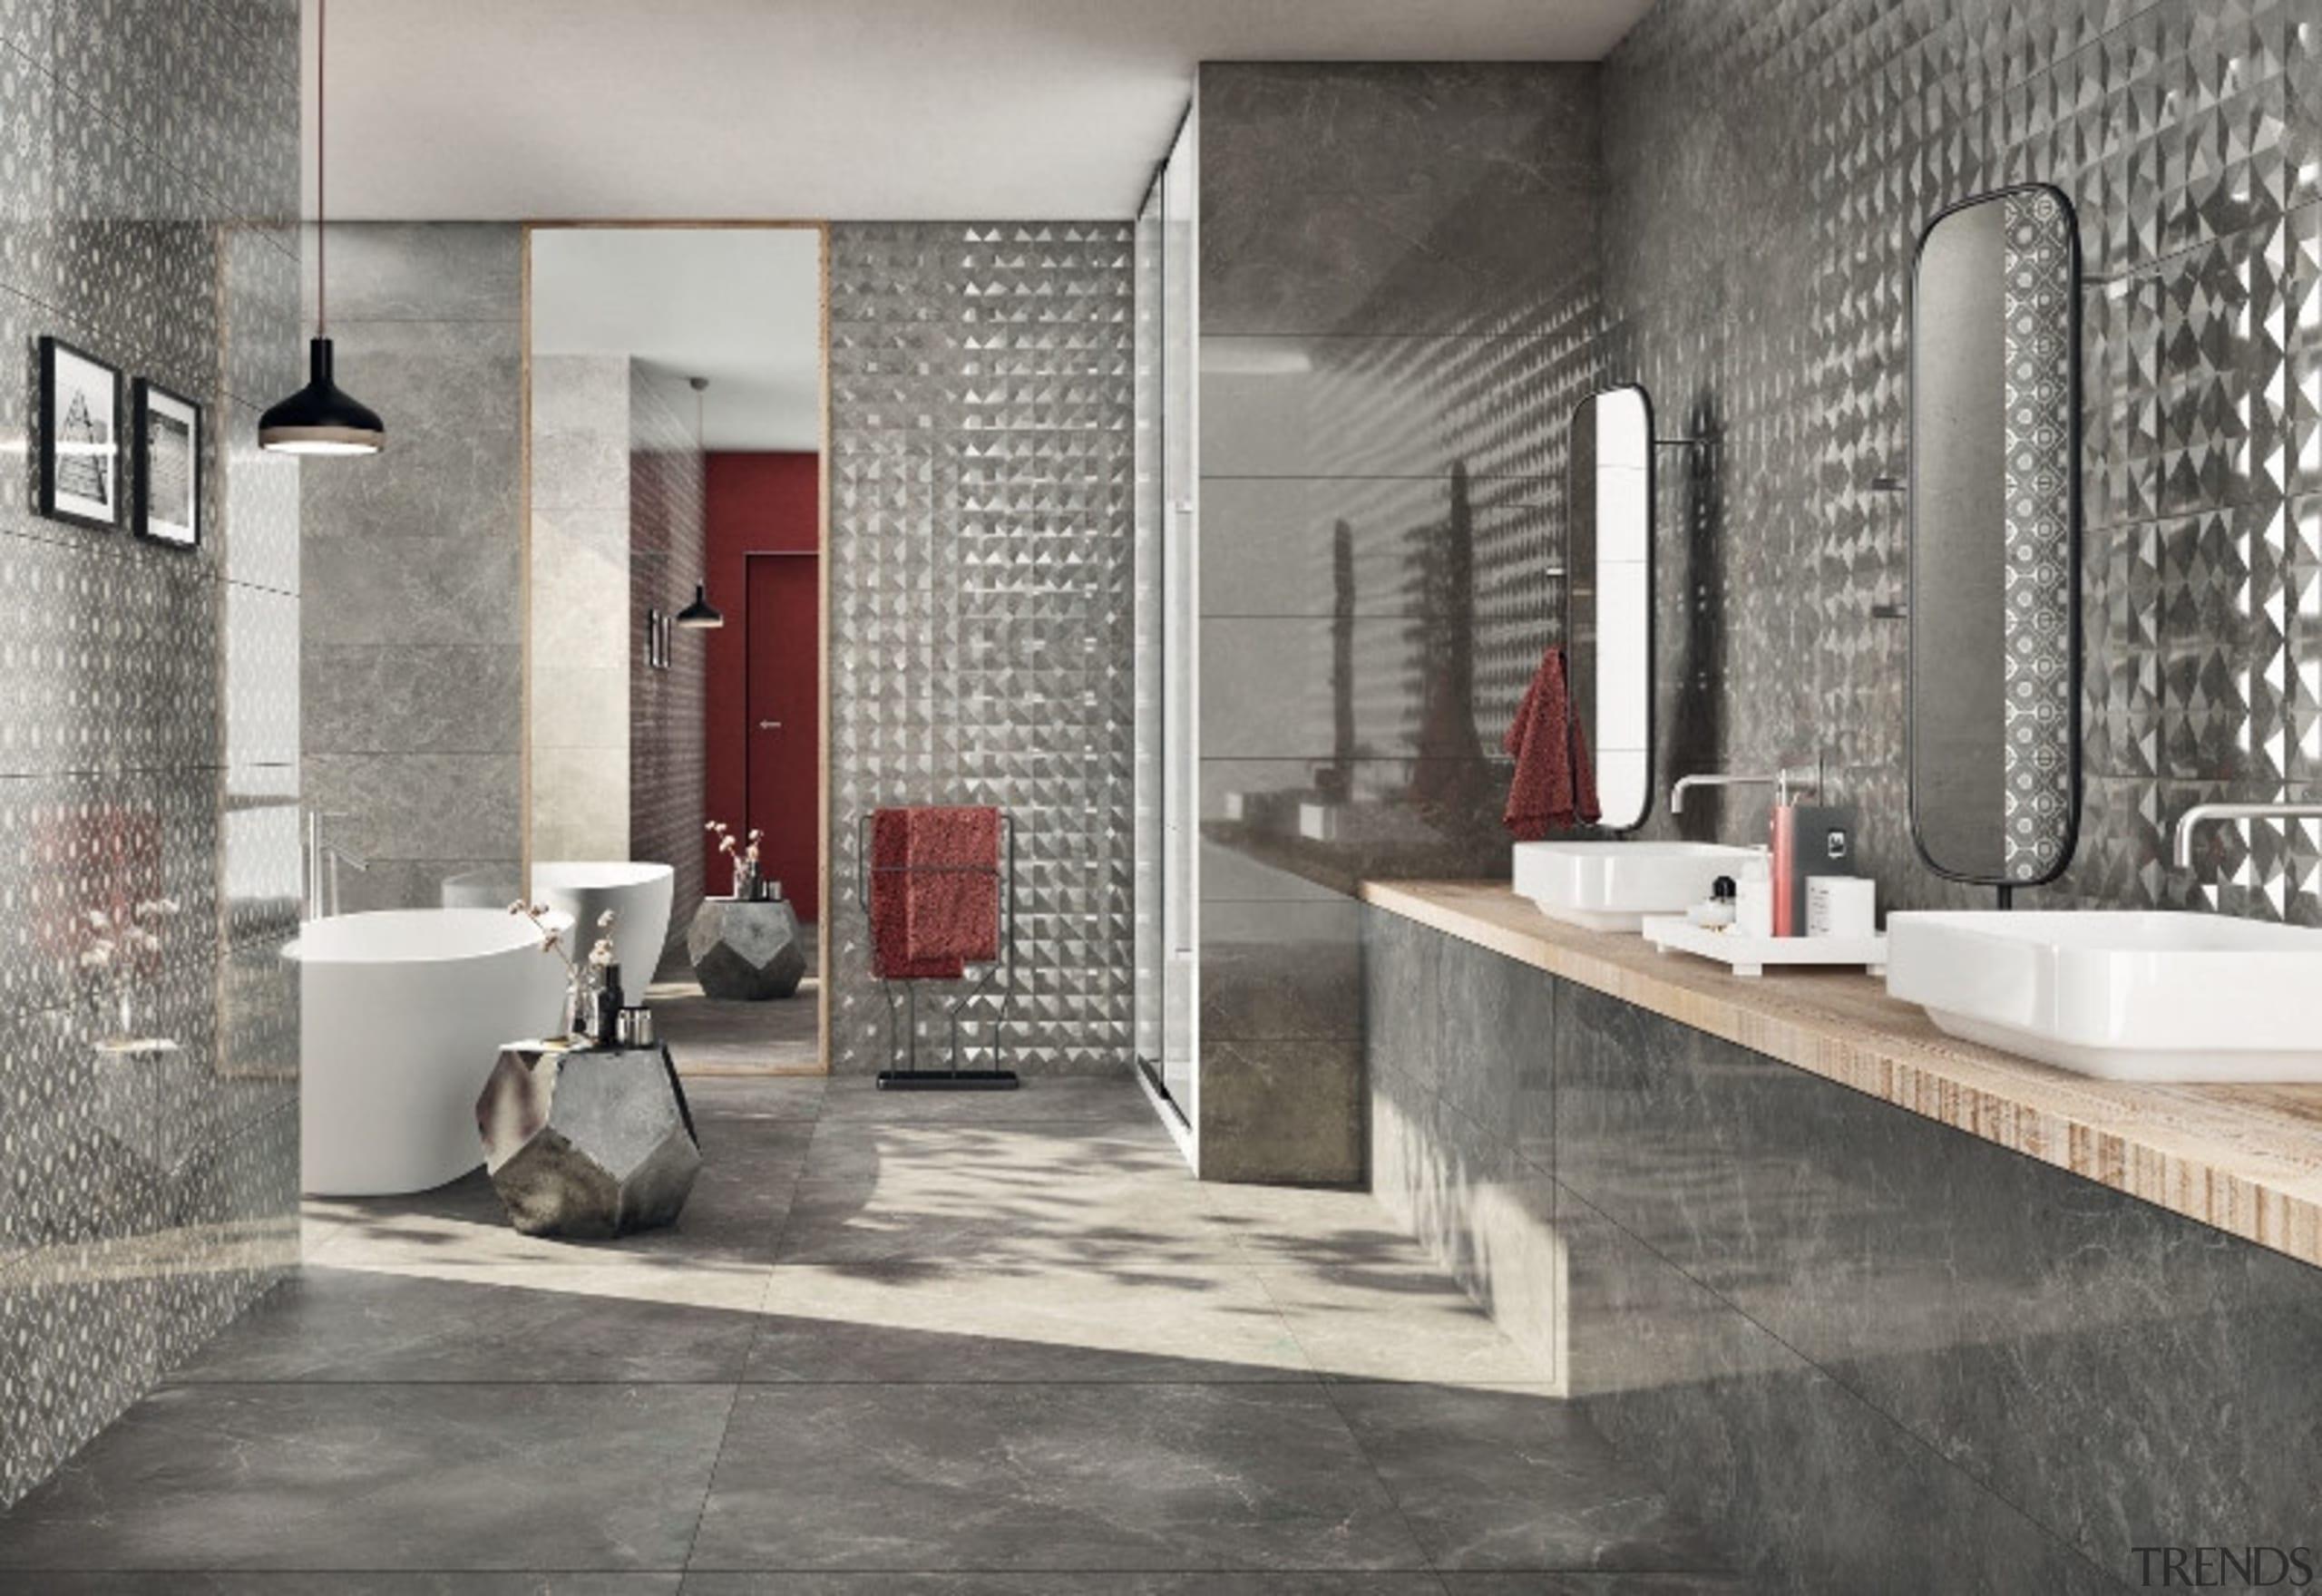 Trilogy Sandy Grey - Trilogy Sandy Grey - bathroom, floor, flooring, interior design, room, tile, wall, gray